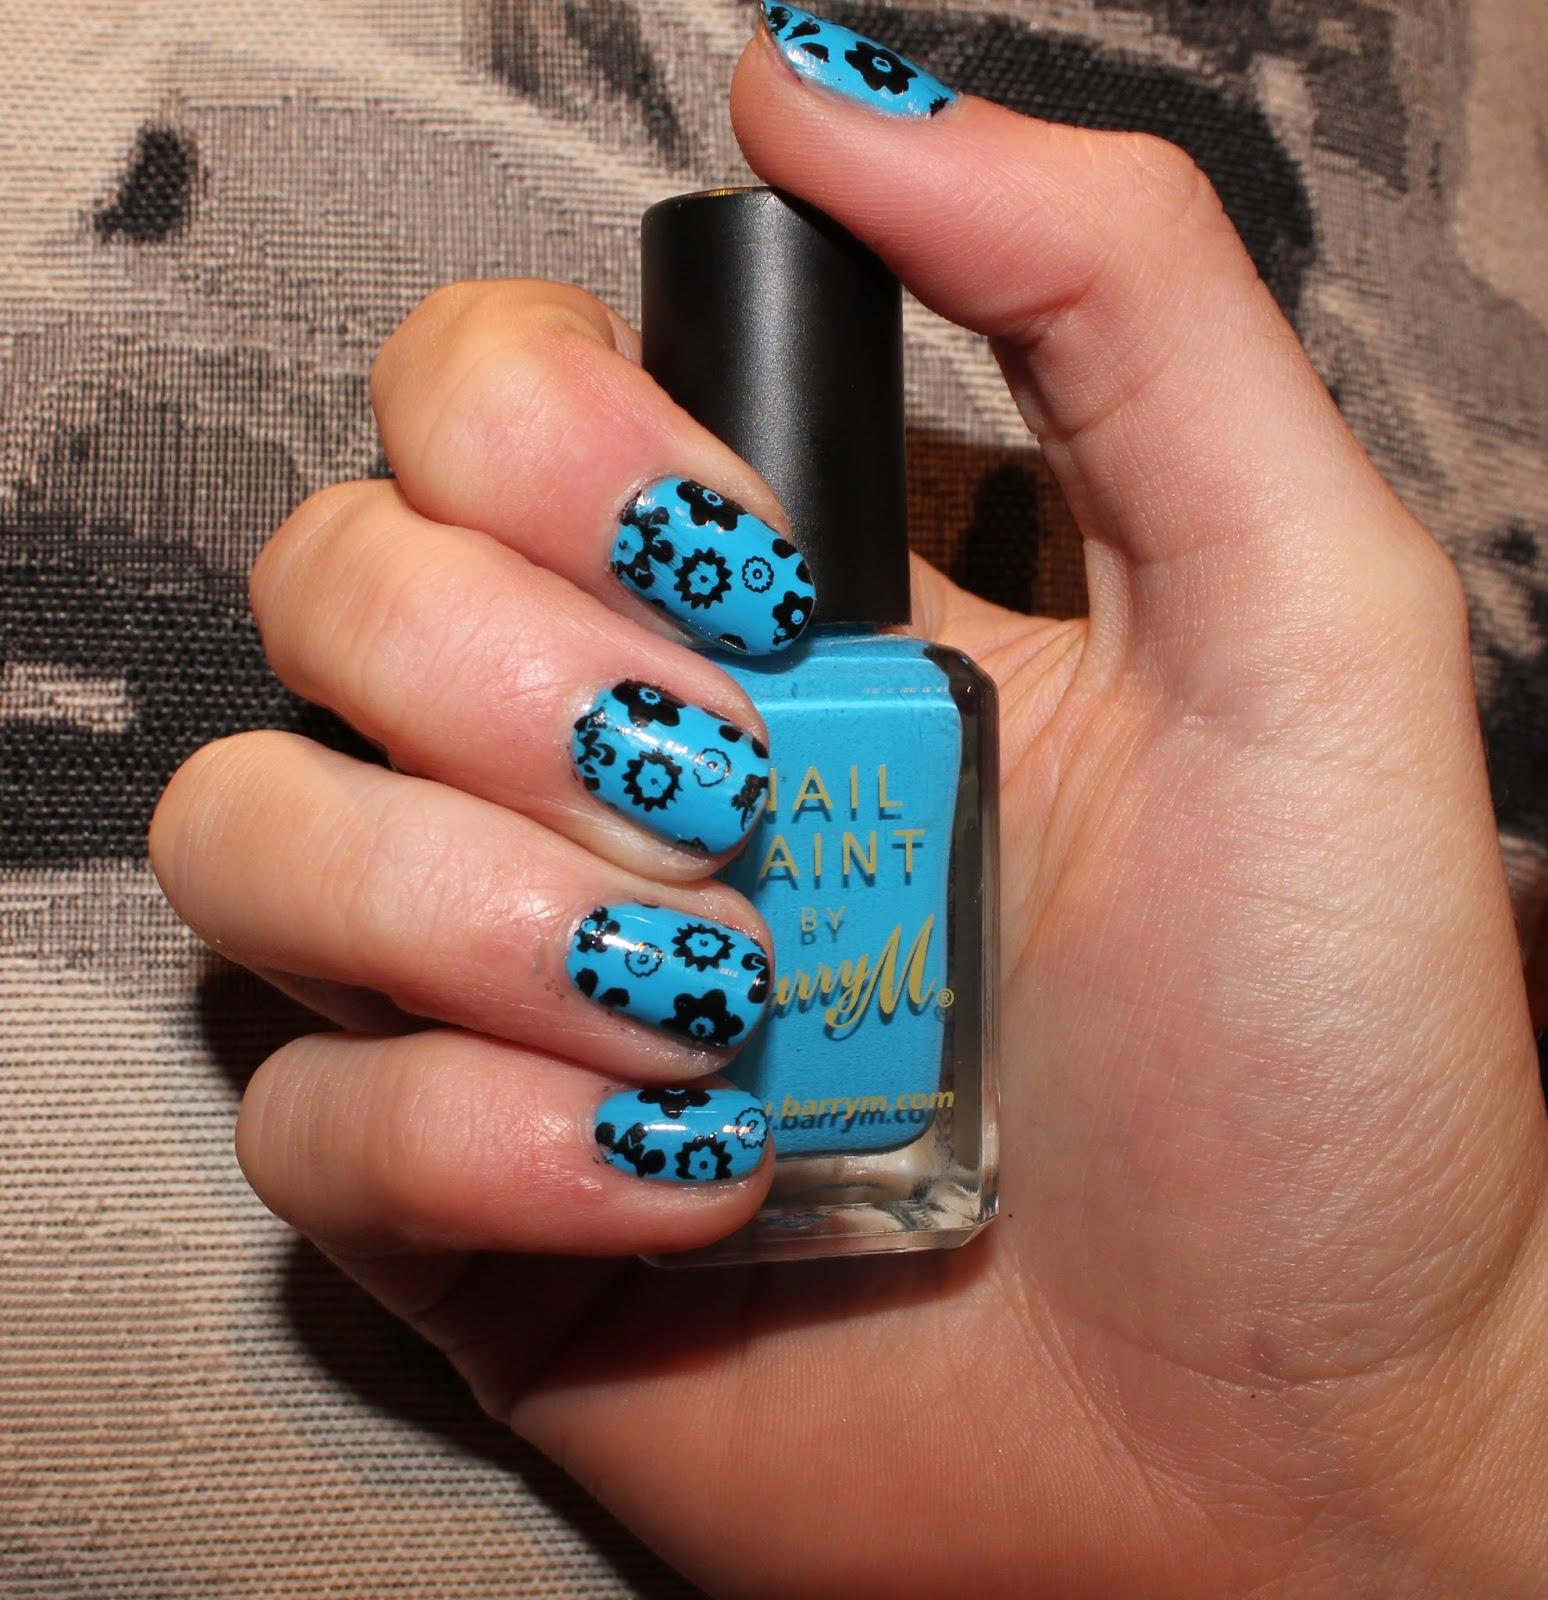 Manicure Monday Moyou Nail Art Nail Stamping Ami Rose